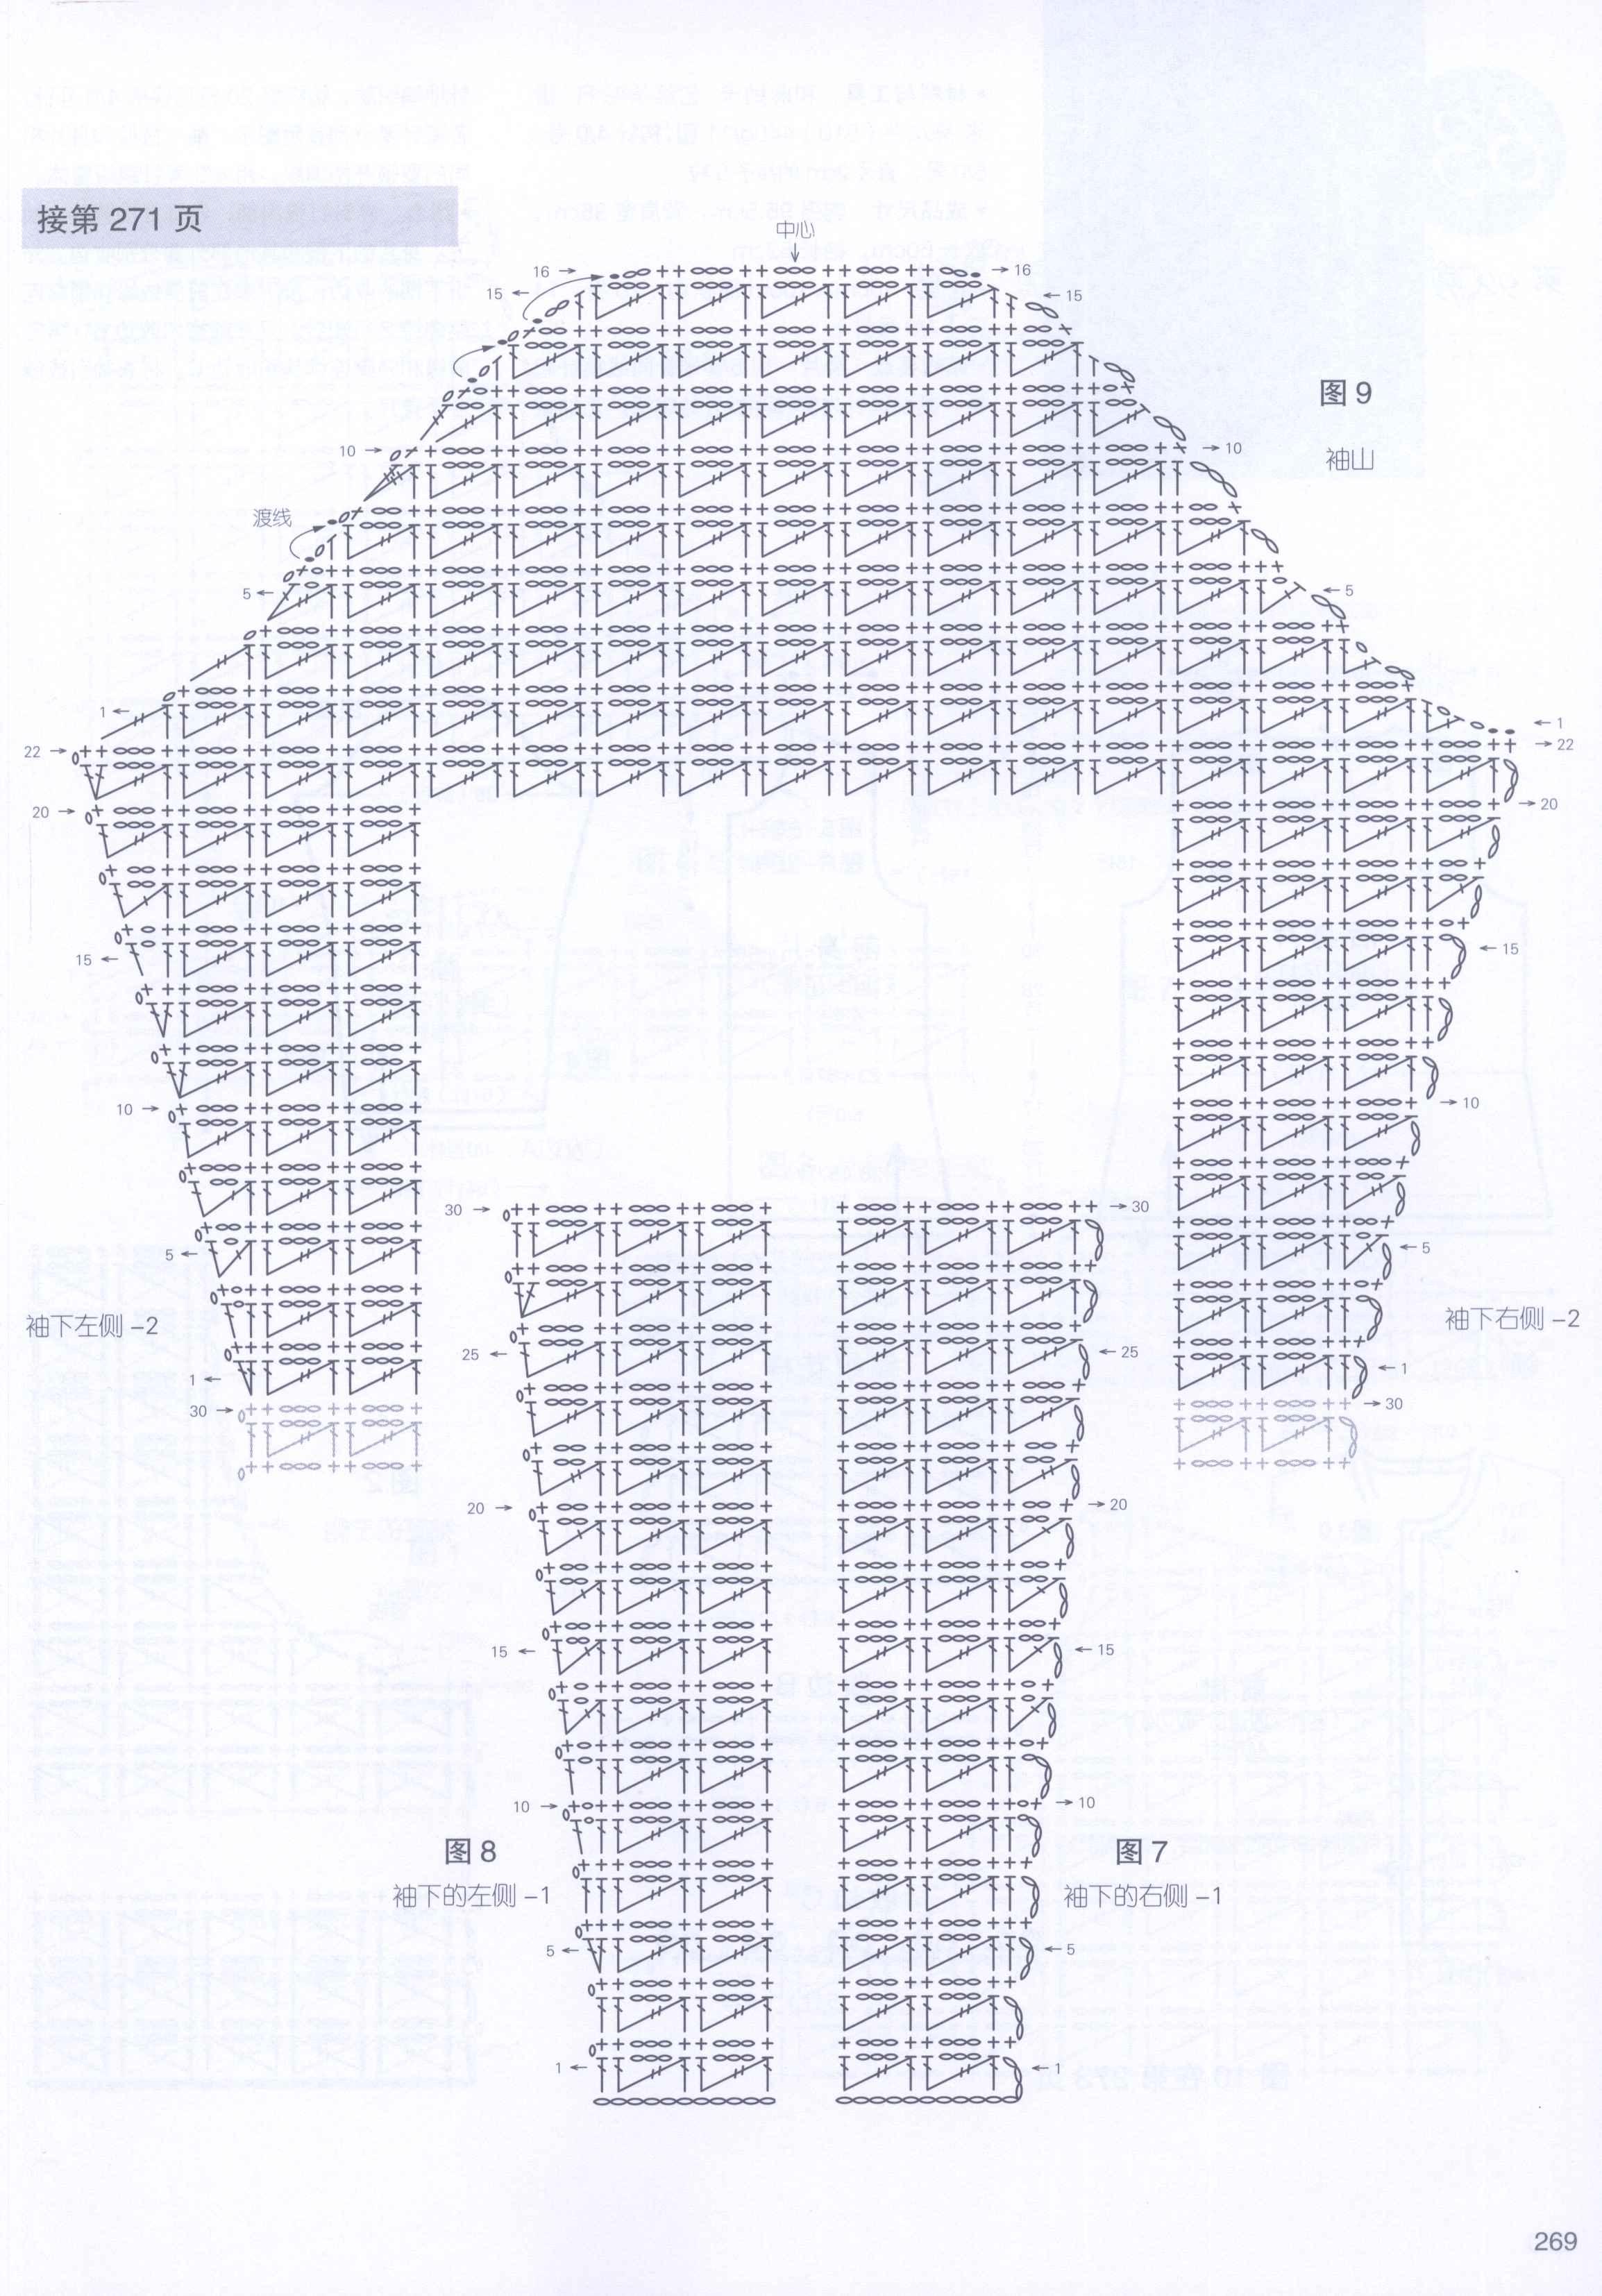 C41uppyl